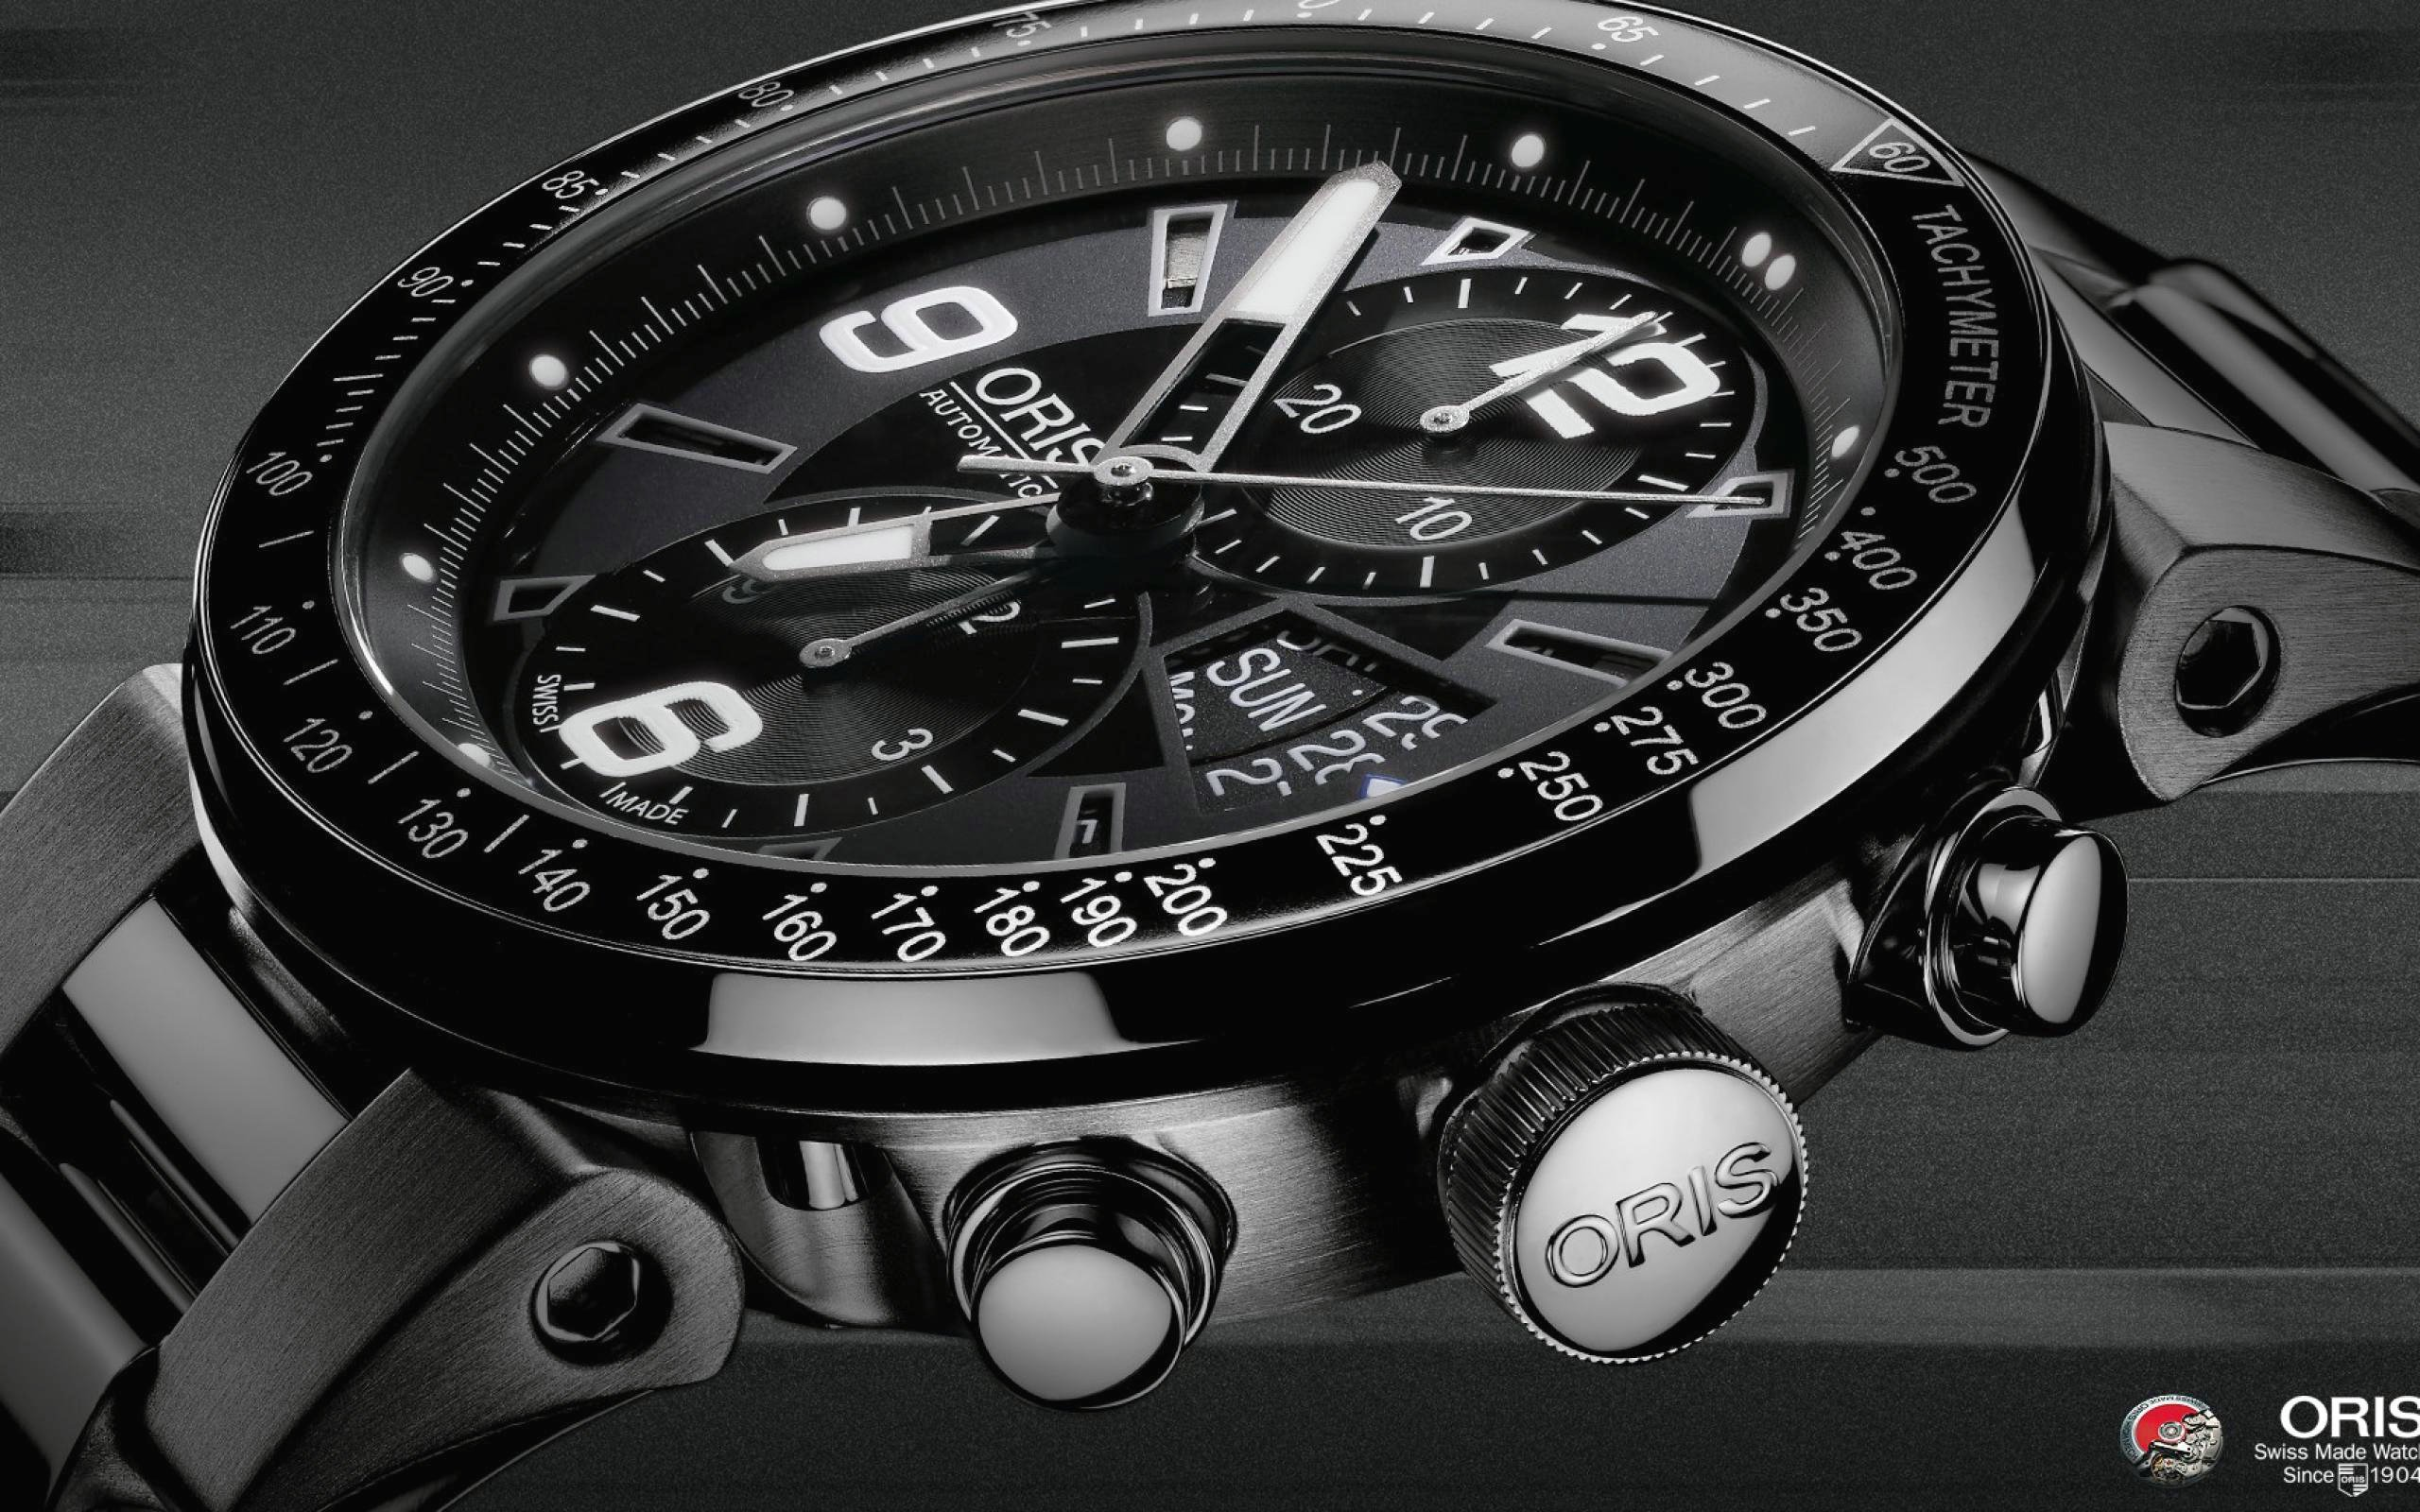 Oris Williams f1 Watch Oris Williams f1 Team Watch